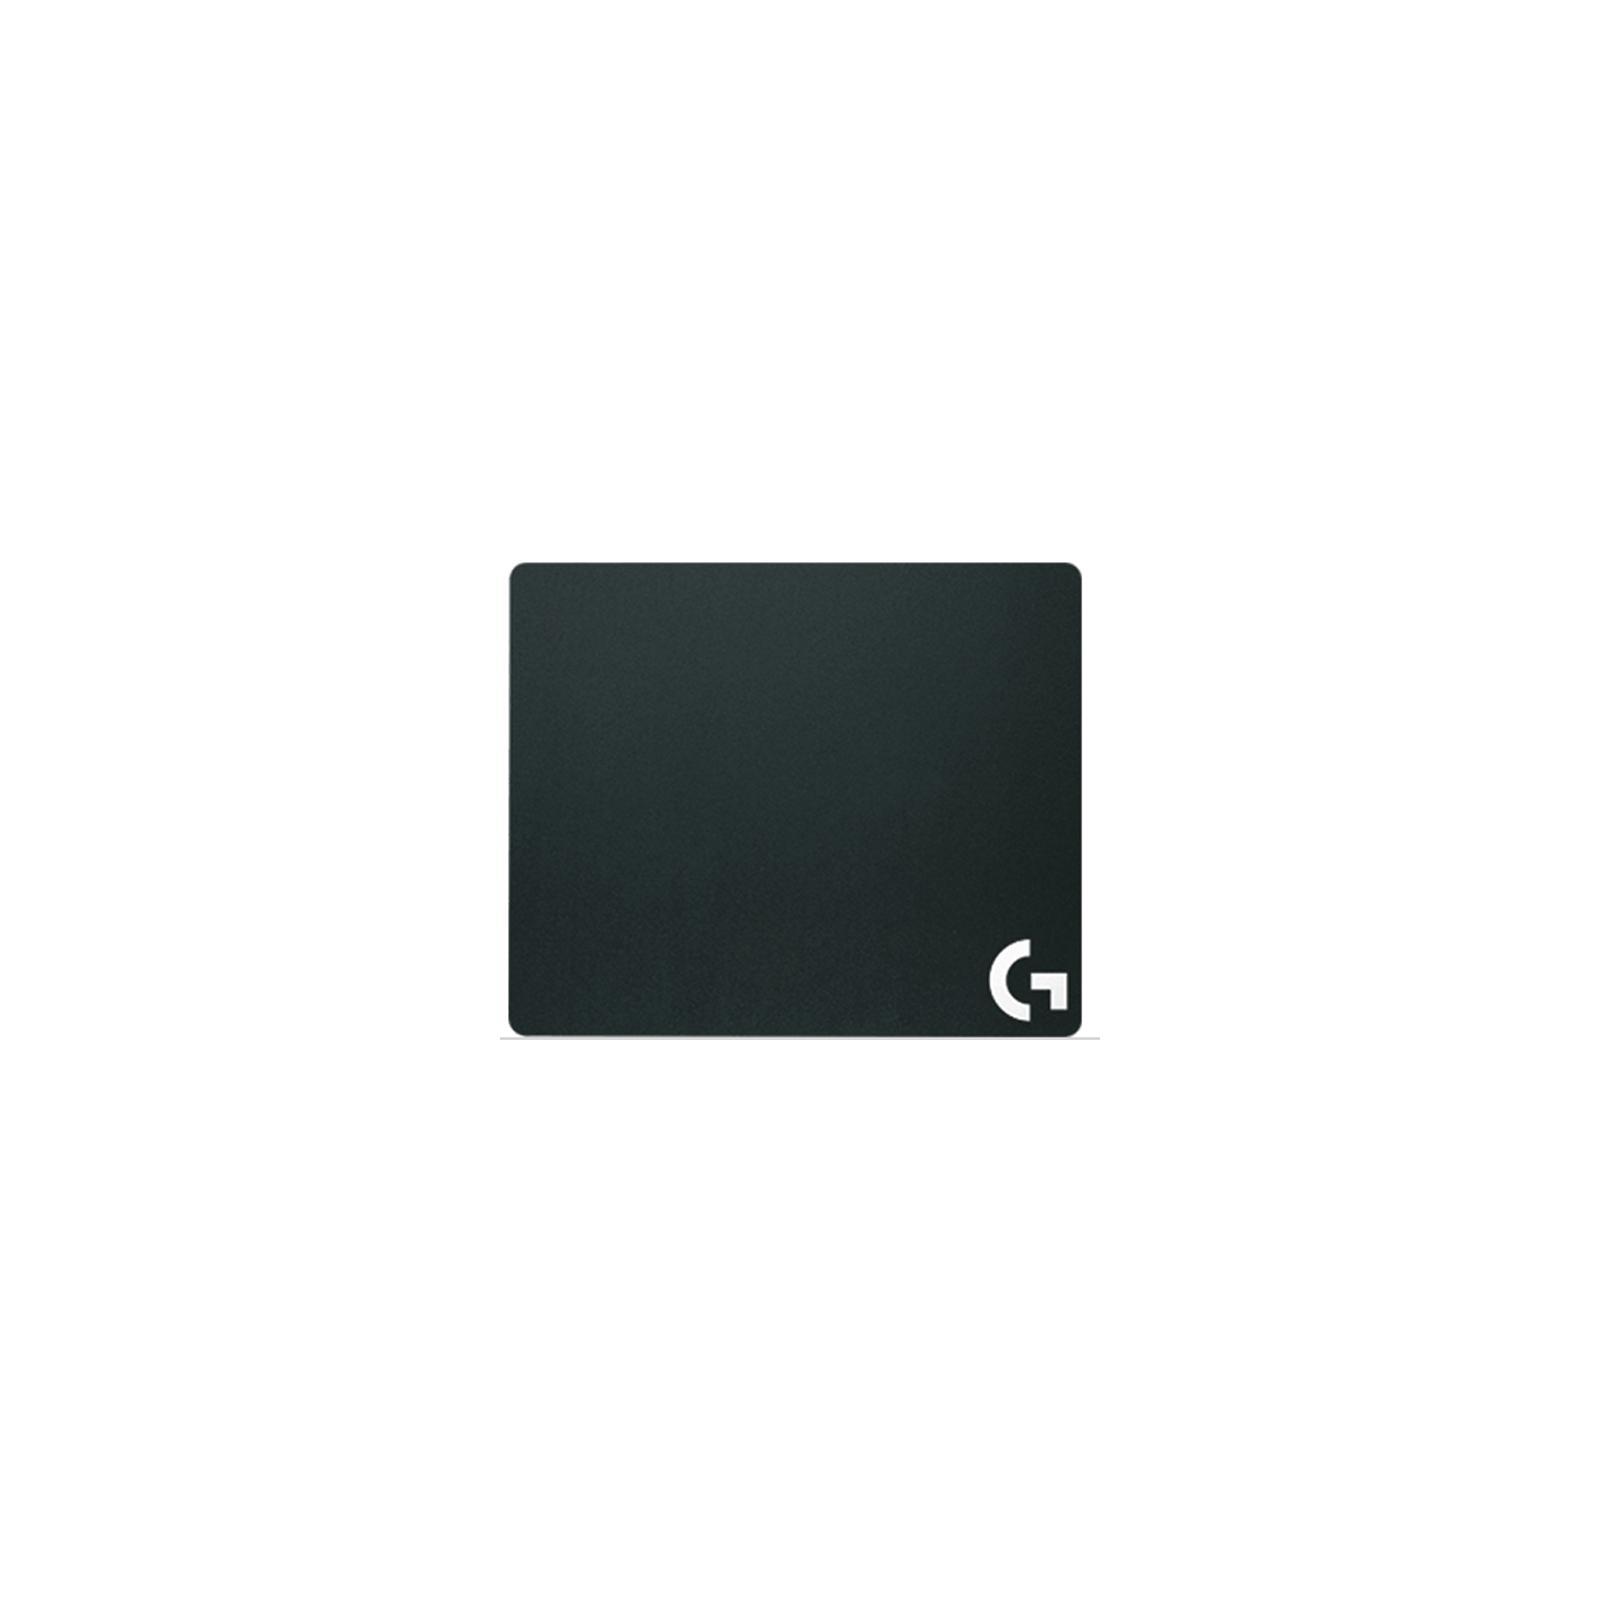 Коврик Logitech G440 Hard Gaming Mouse Pad (943-000099) изображение 2